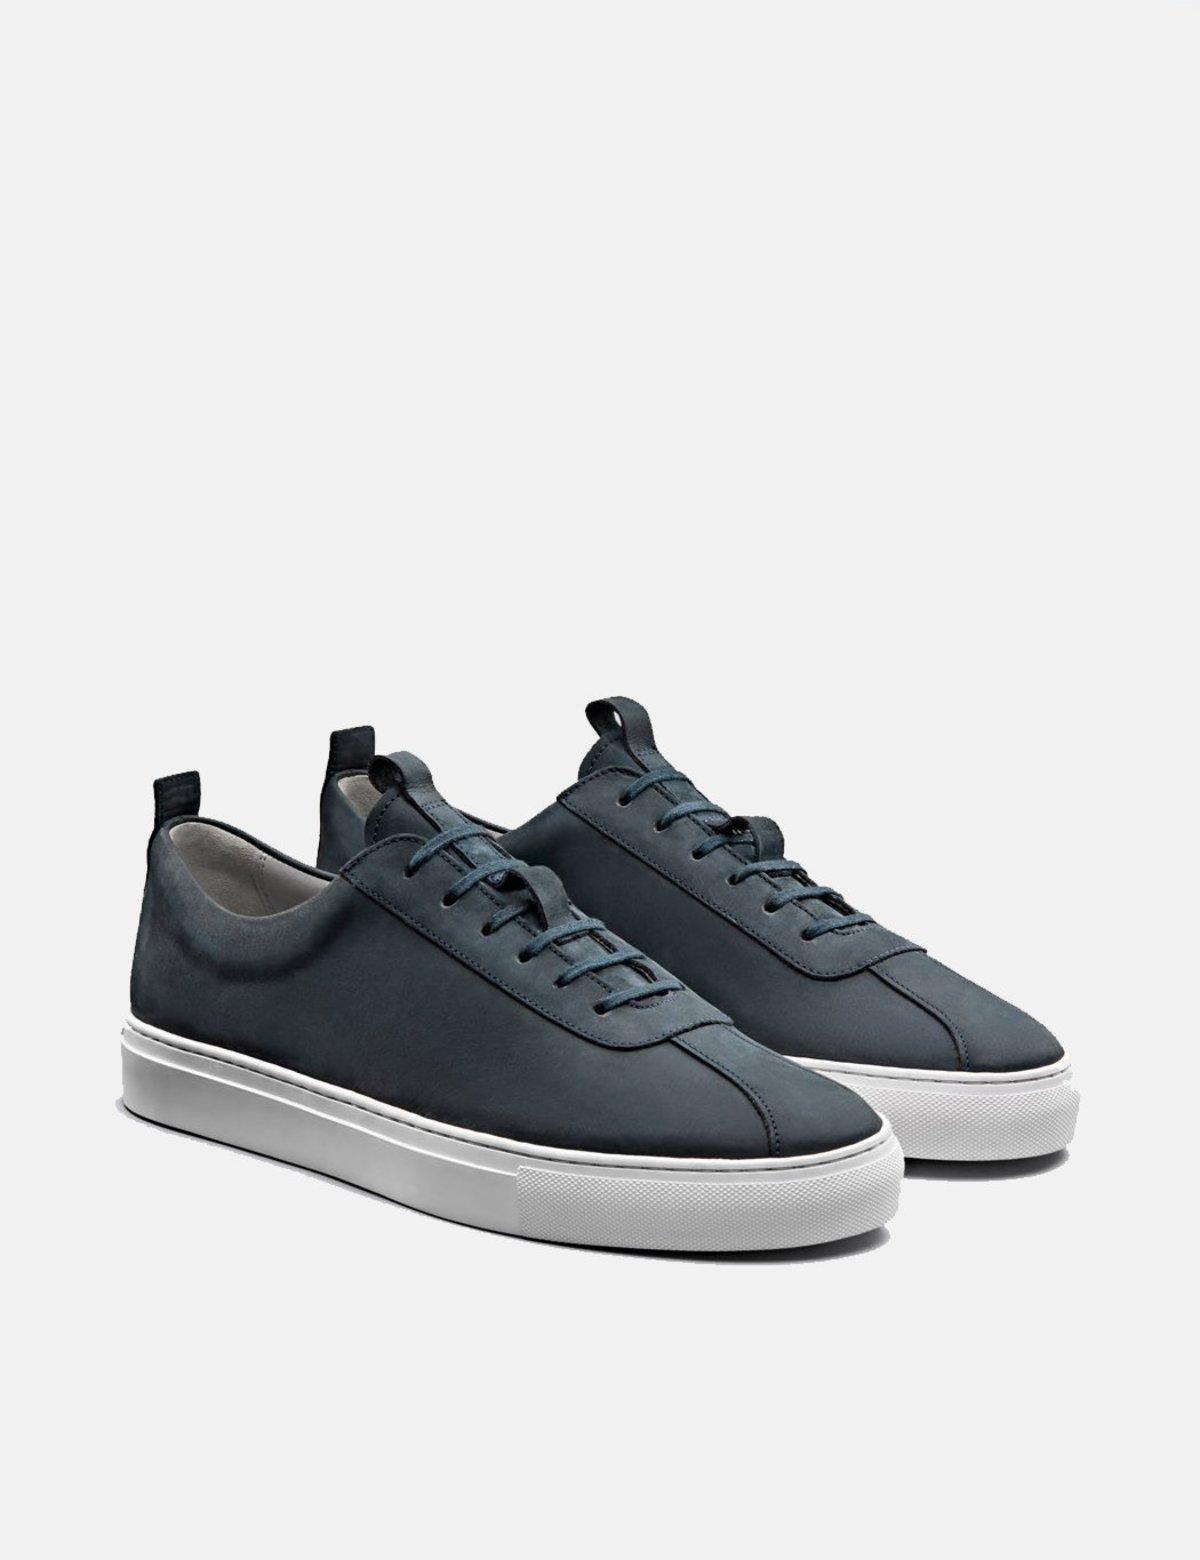 Grenson 1 Nubuck Sneakers - Navy Blue